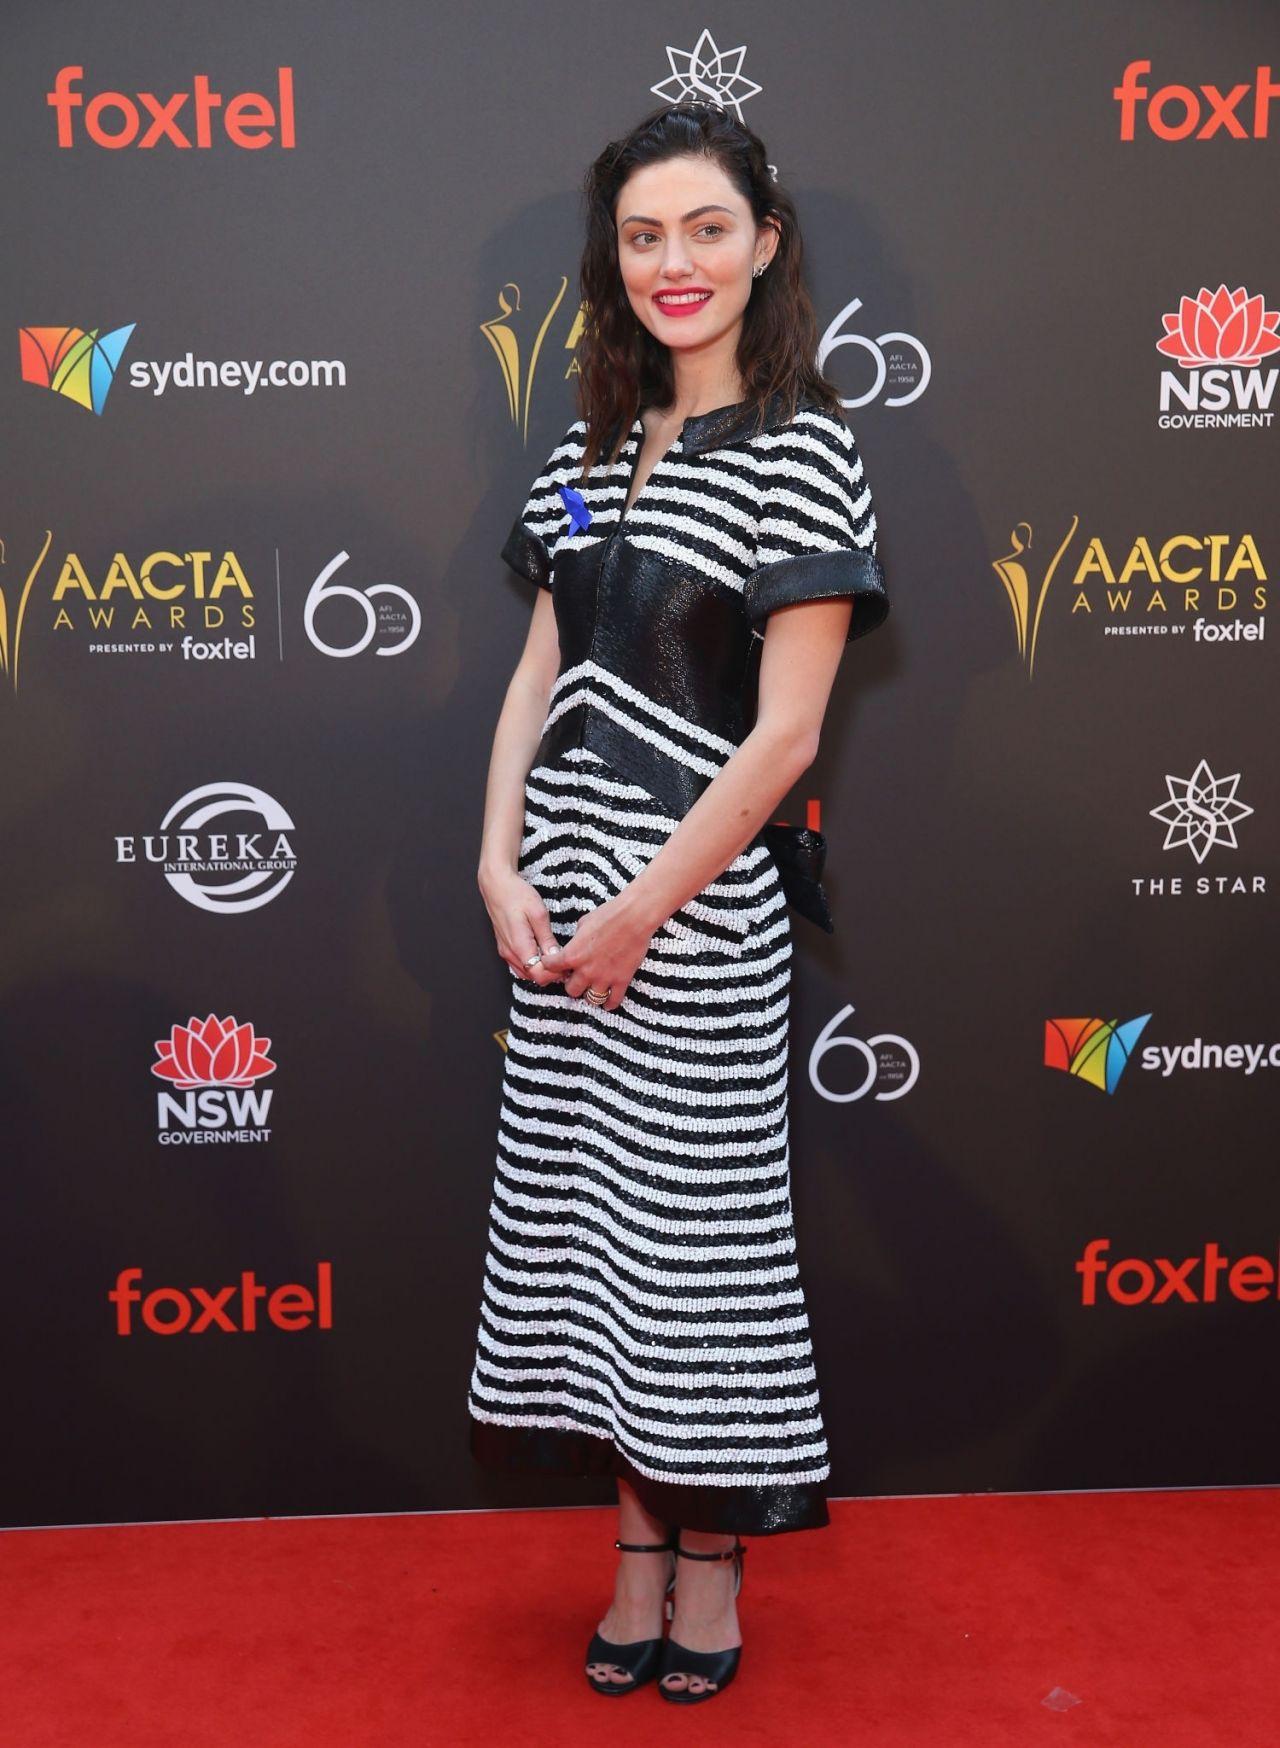 aacta awards - photo #7